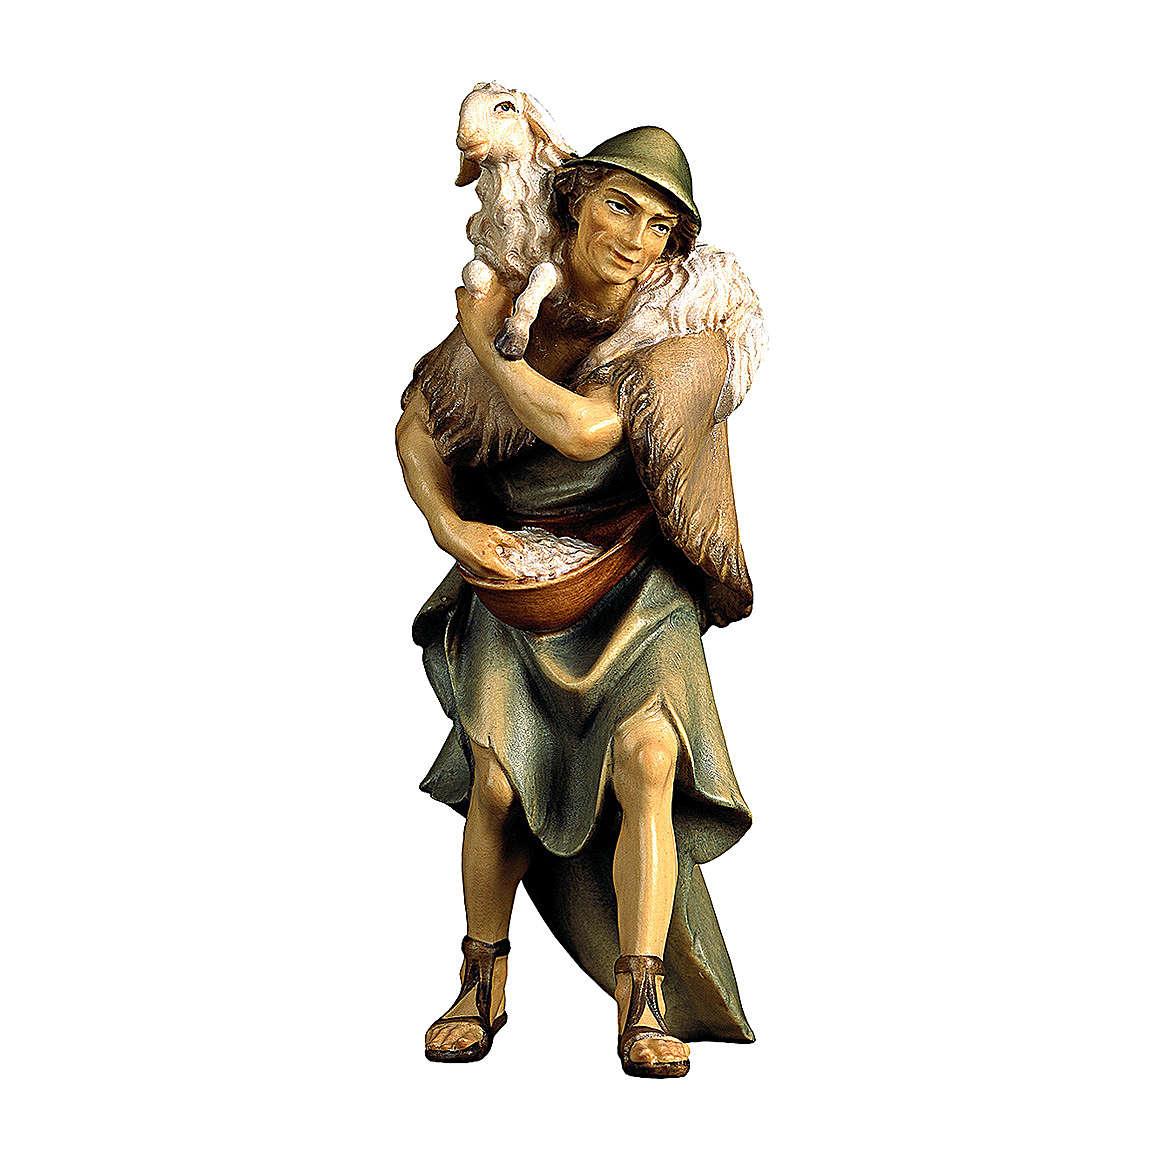 Pastore e pecora sulle spalle presepe Original legno dipinto Valgardena 12 cm 4